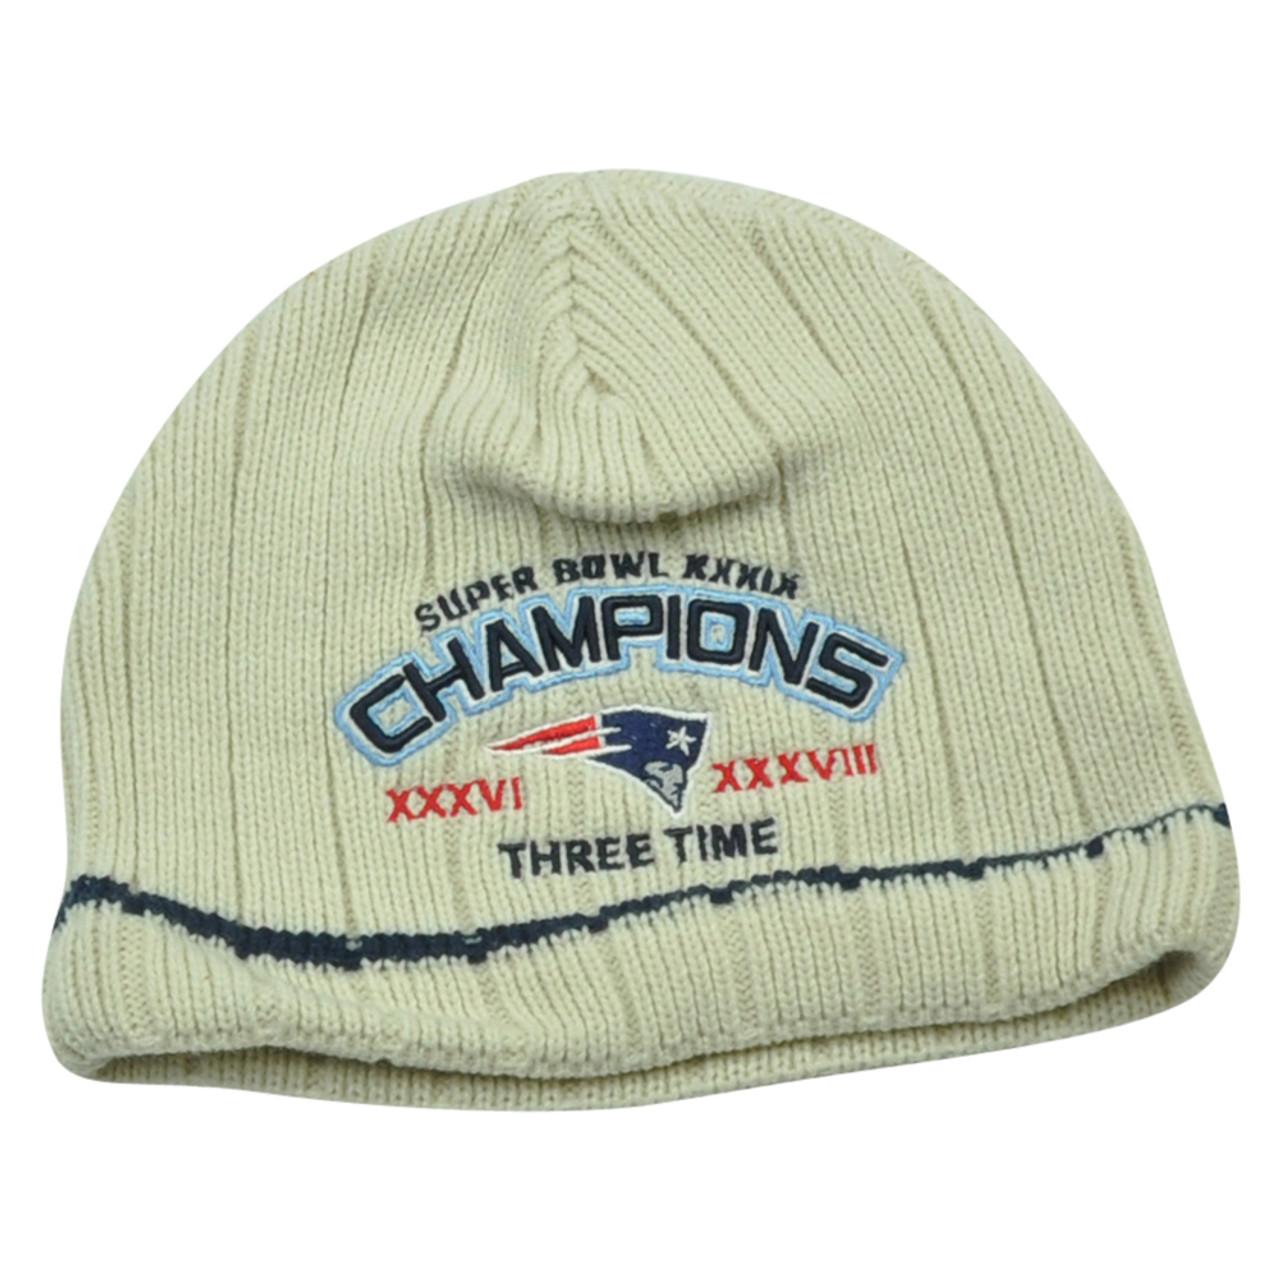 c075c6bf NFL New England Patriots Stark 3 Time Super Bowl Champions Cuffless Knit  Beanie